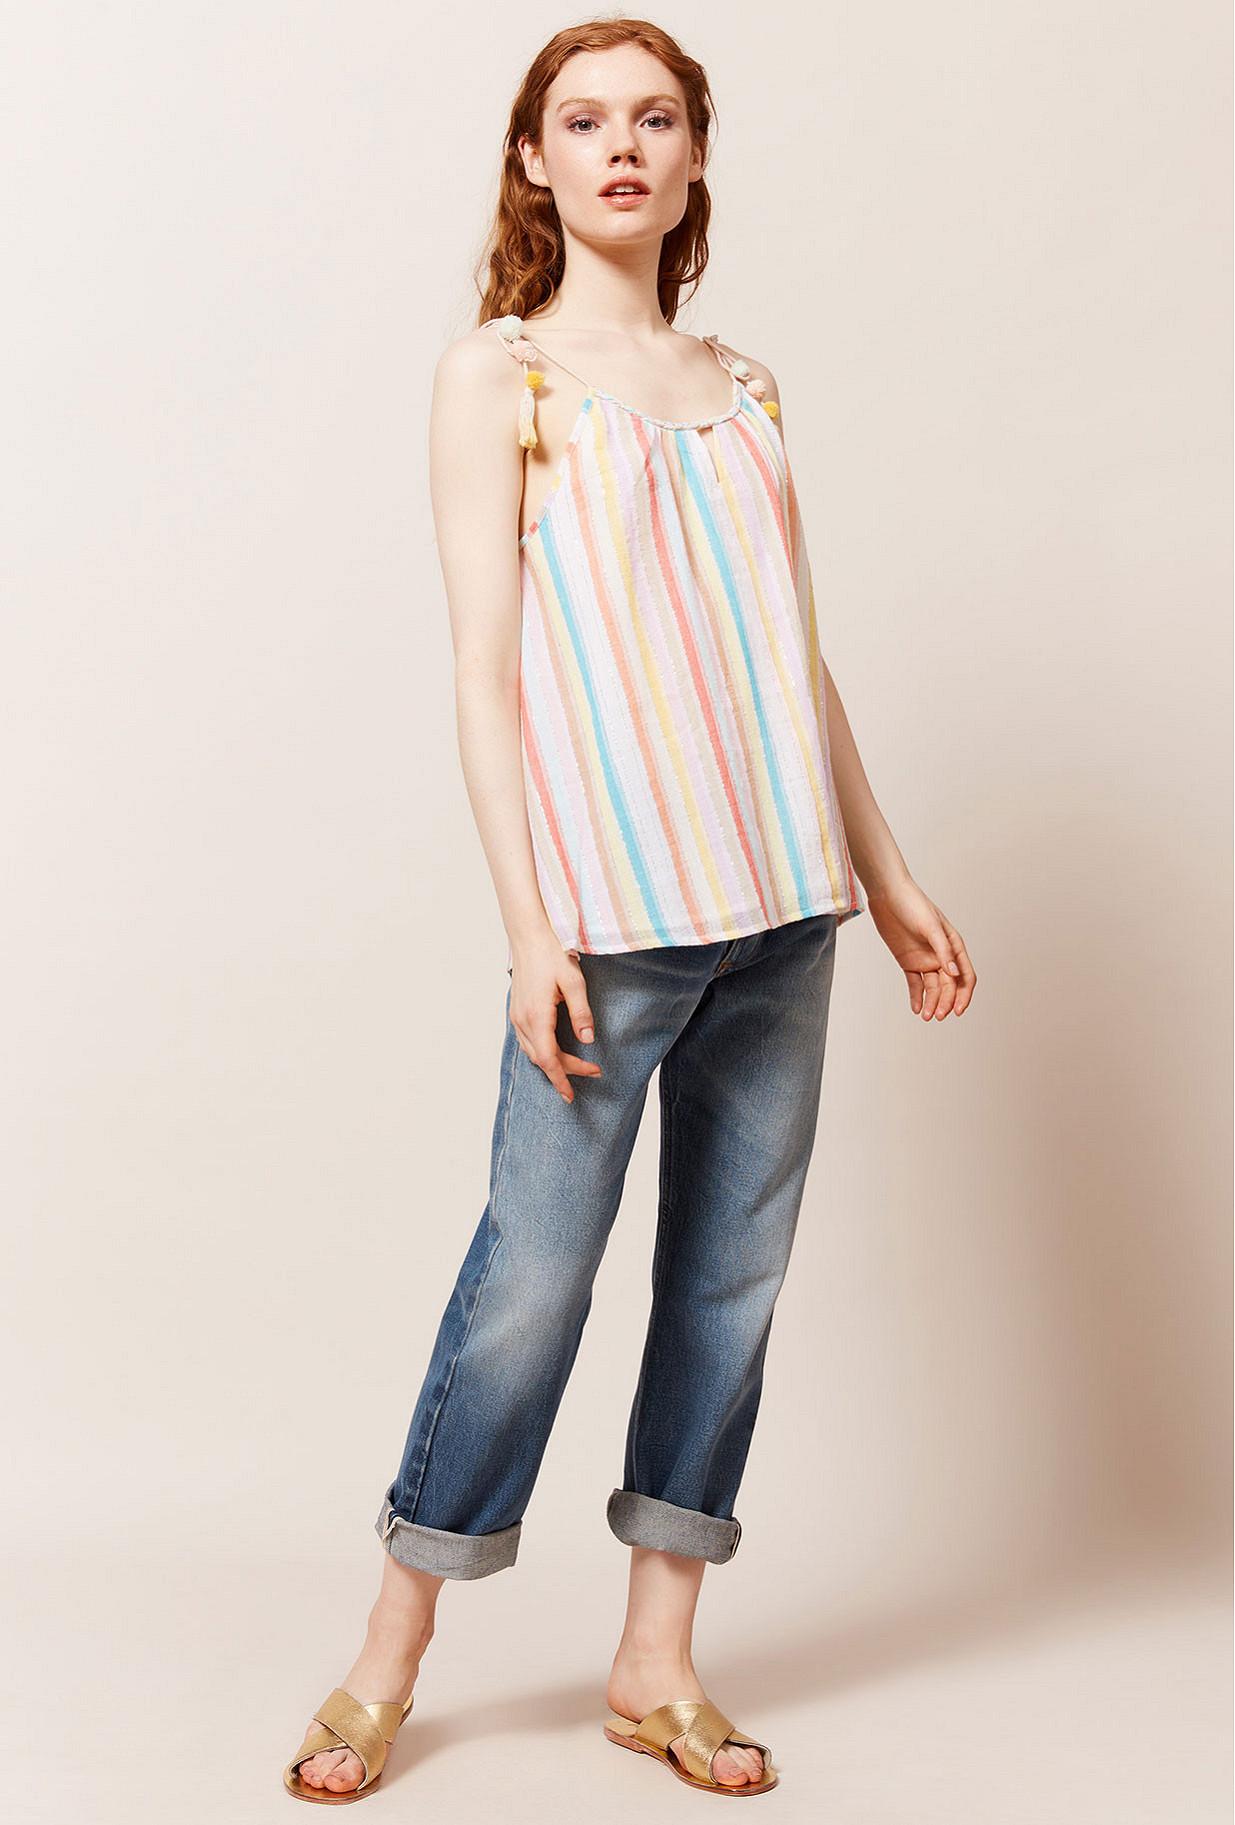 Paris clothes store Top  Riri french designer fashion Paris